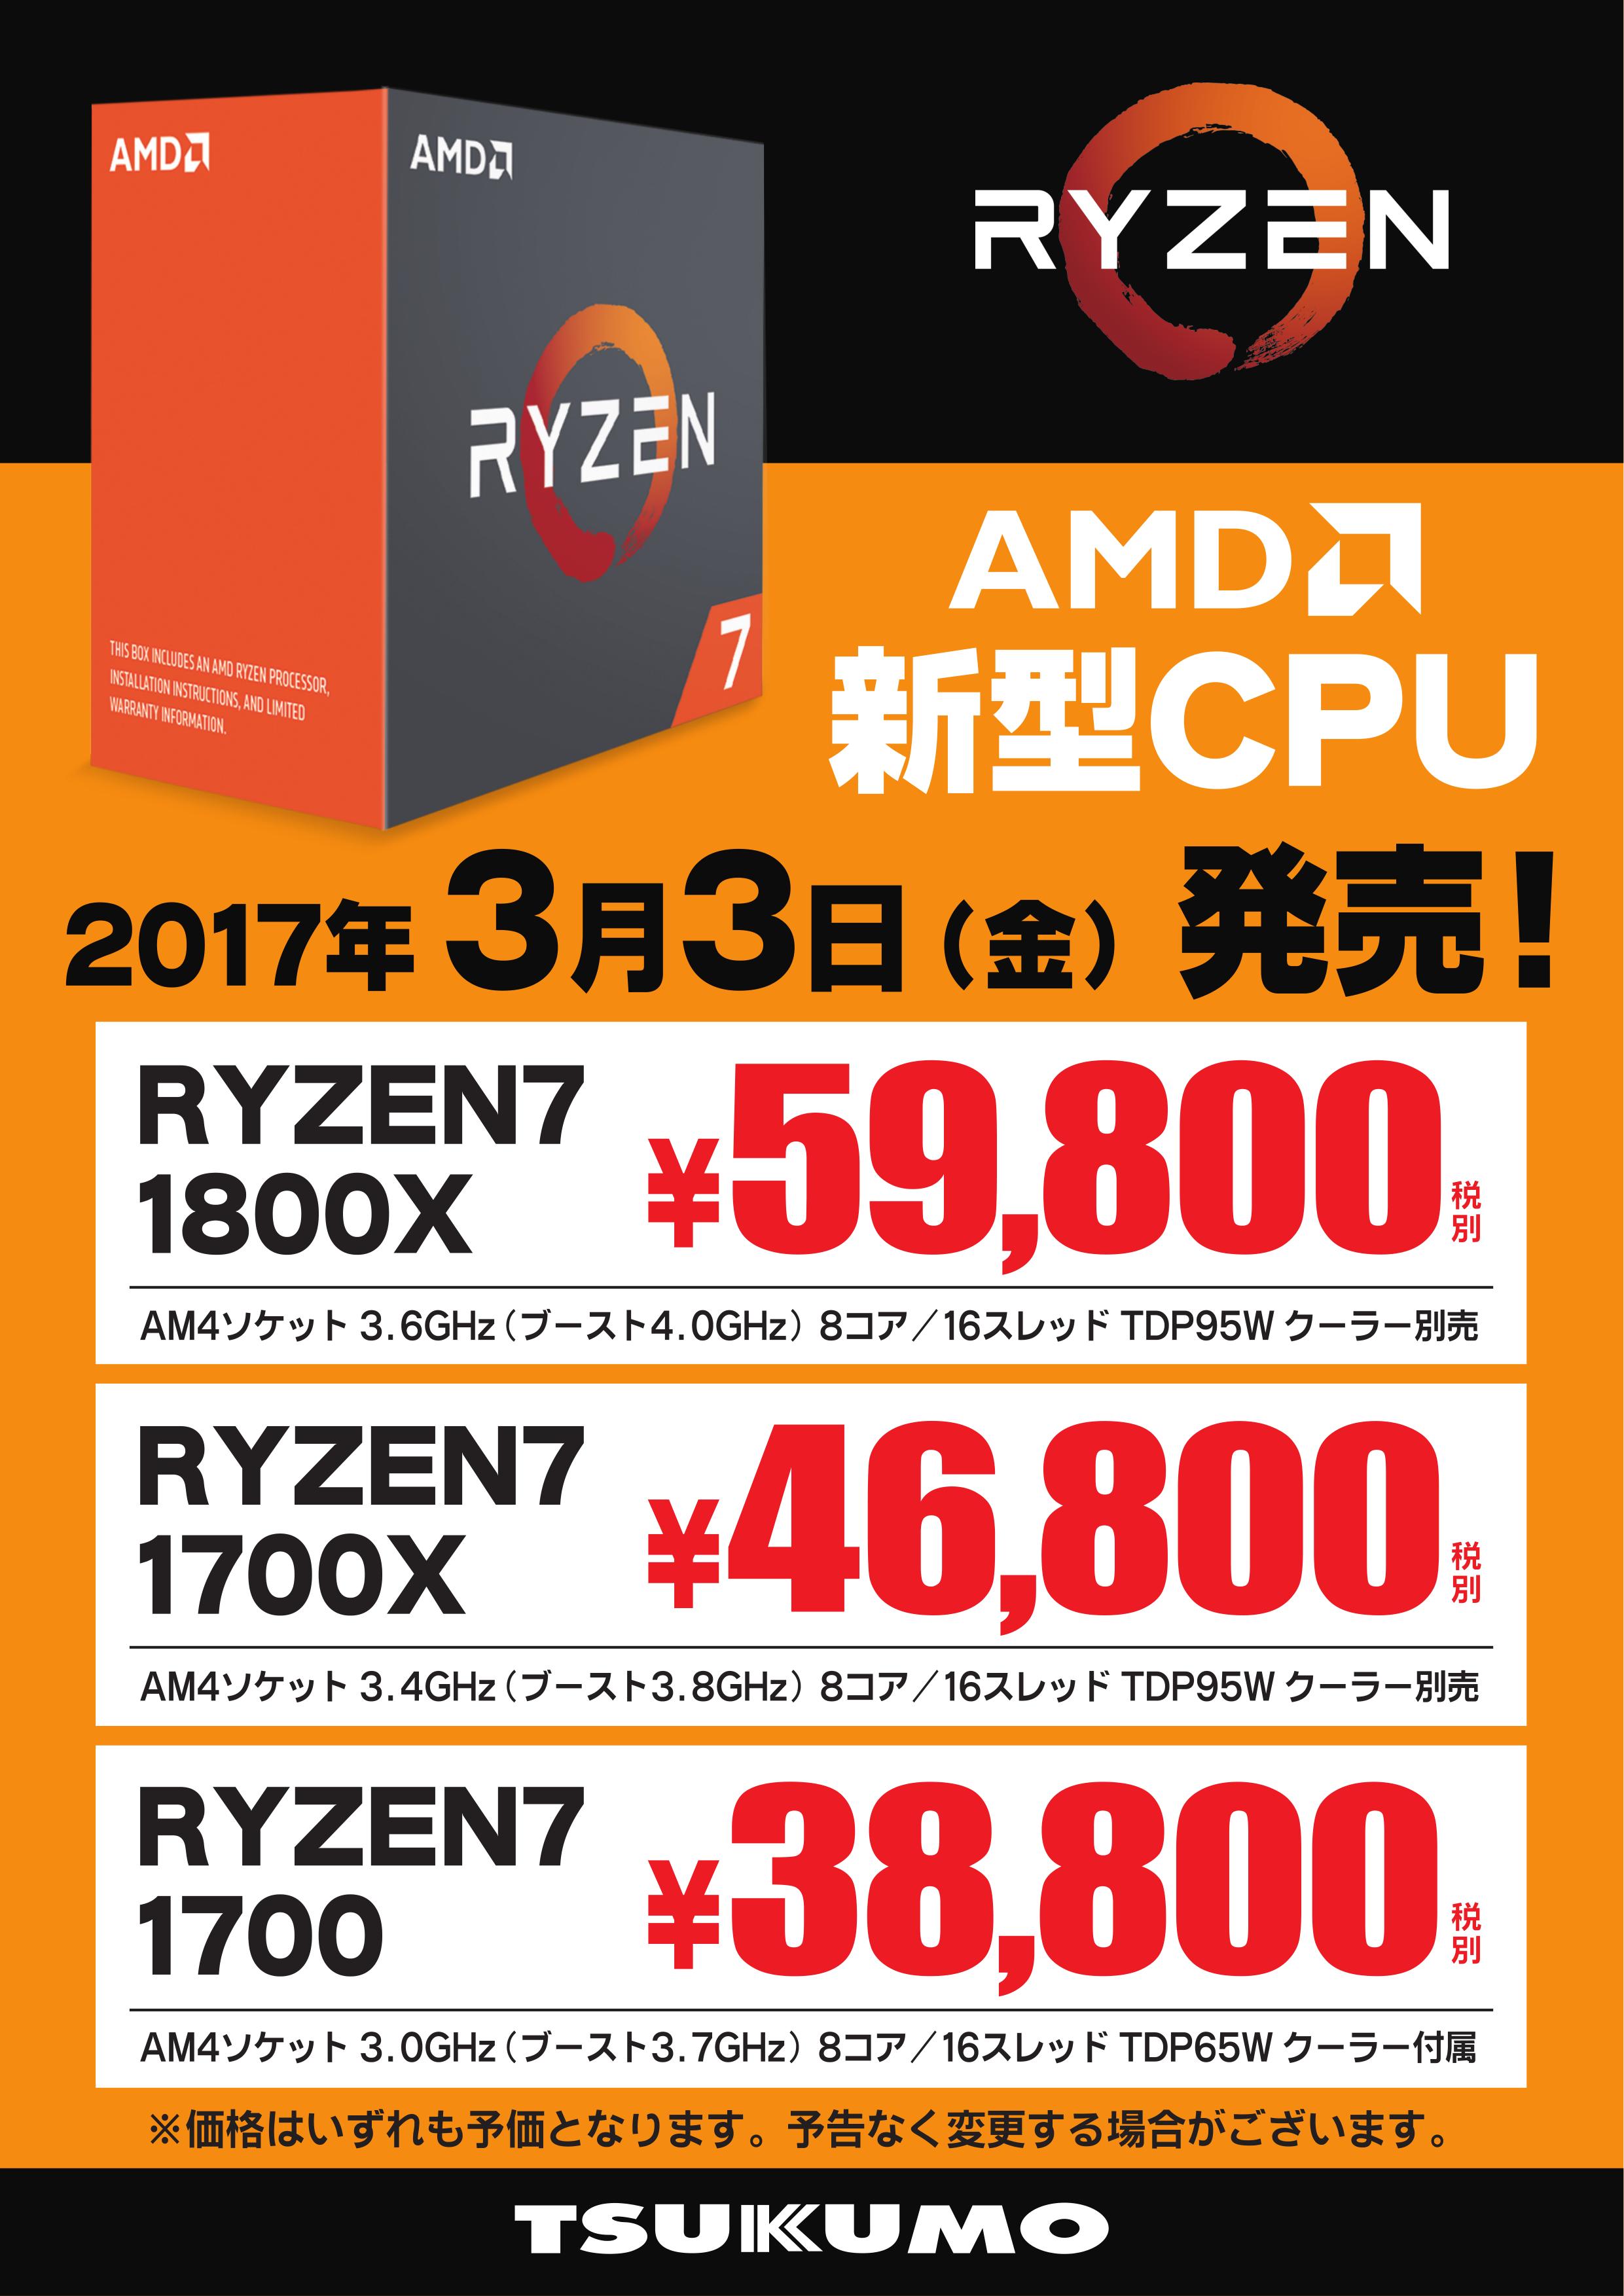 AMD 新APU RYZEN 発売 プライス_imgs-0001.png